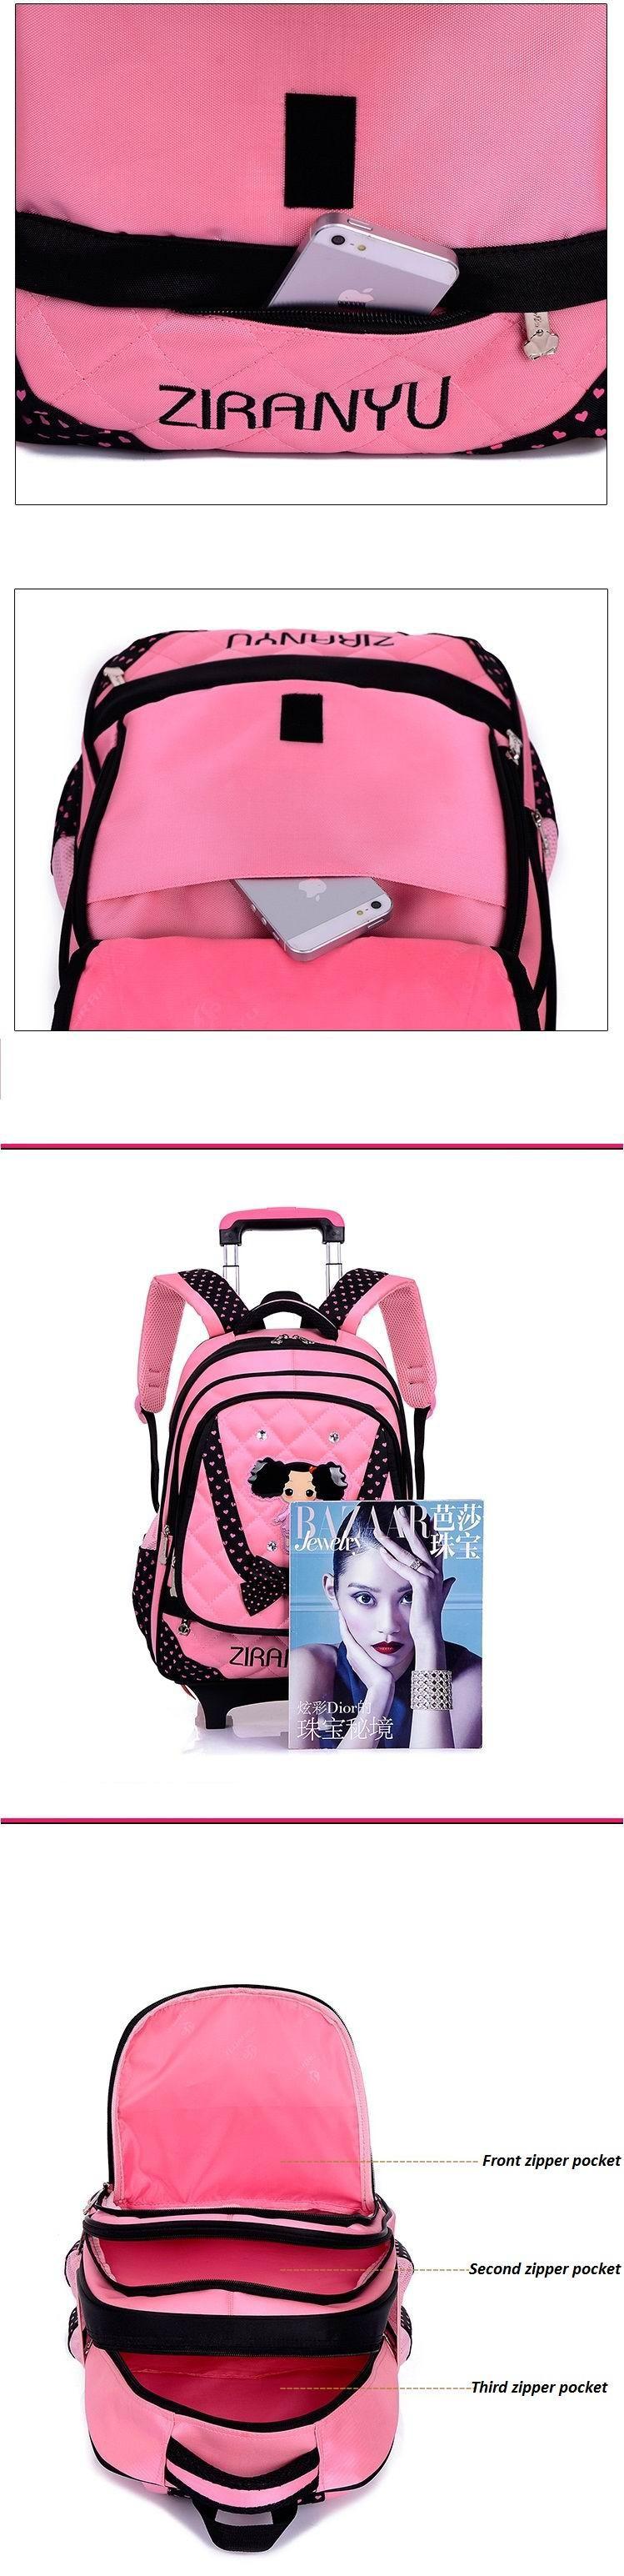 kids-wheeled-school-backpack-children-school-trolley-backpack-carton-pattern-rolling-luggage-kids-detachable-and-orthopedic-8